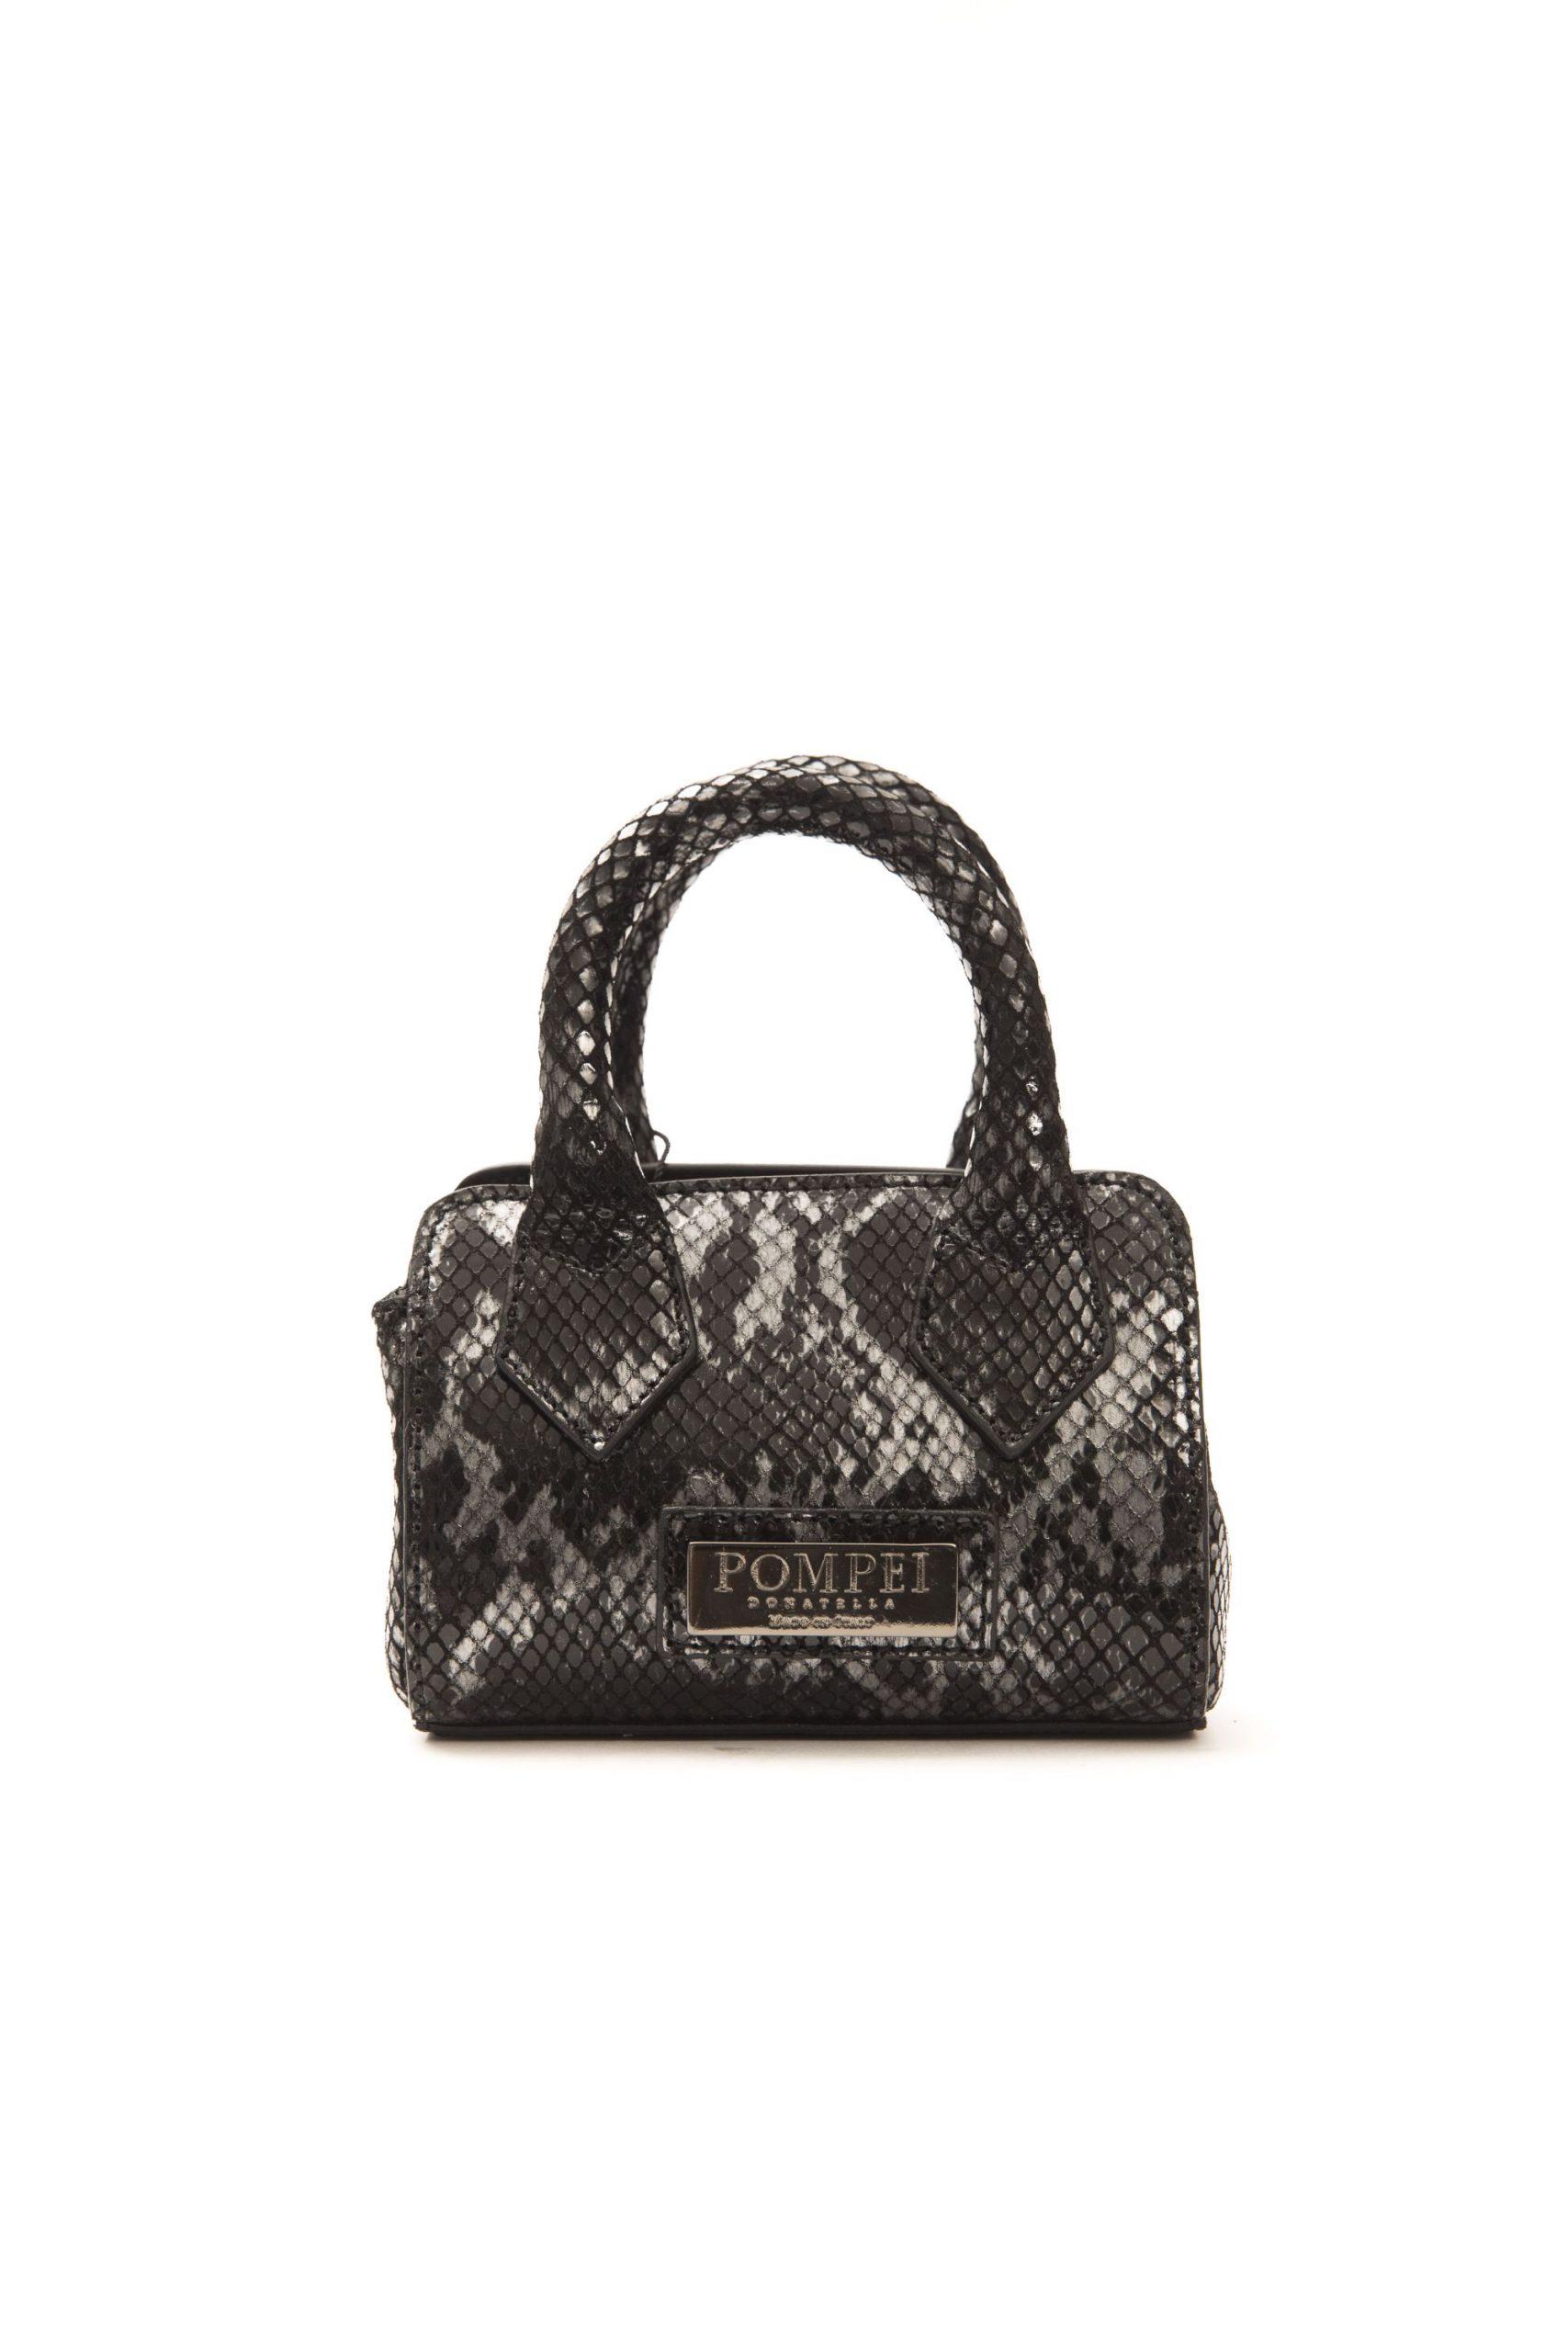 Pompei Donatella Women's Handbag Grey PO667778